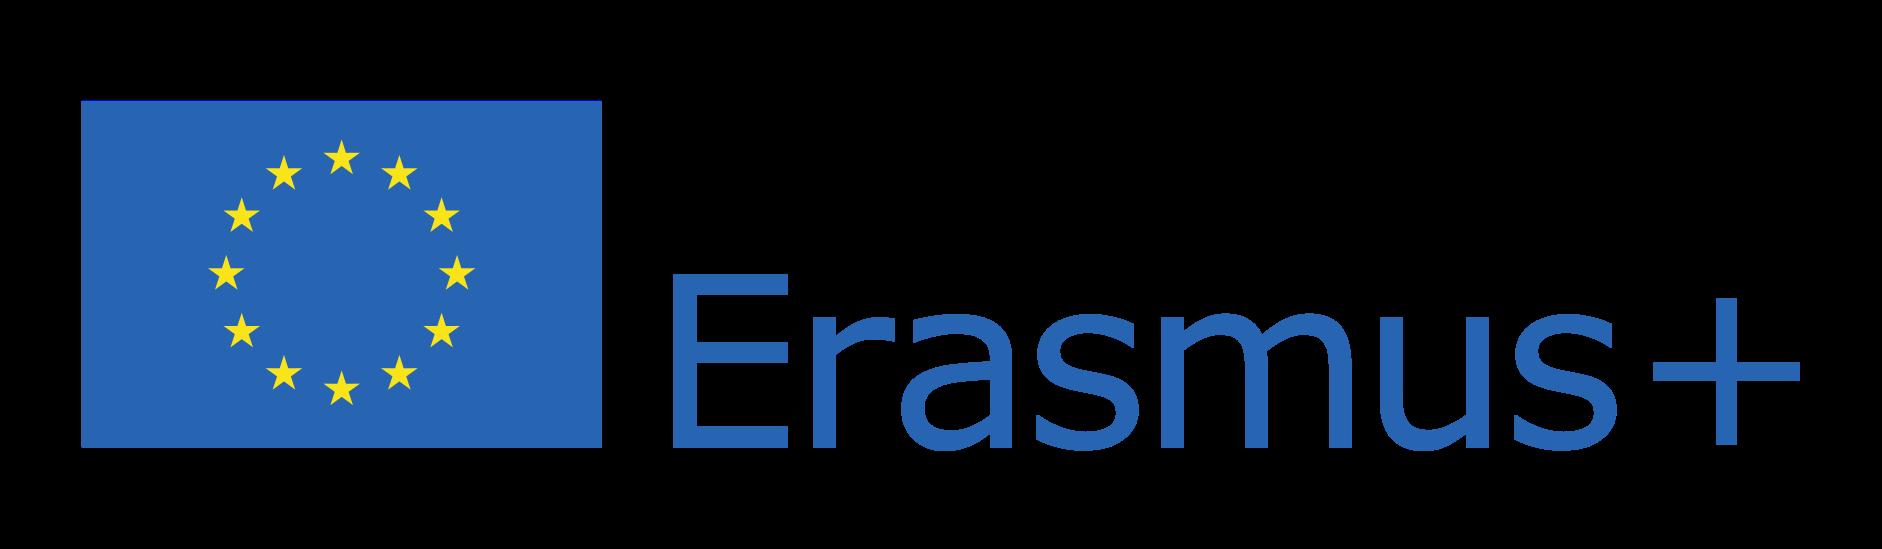 1920px-Erasmus+_Logo.svg.png